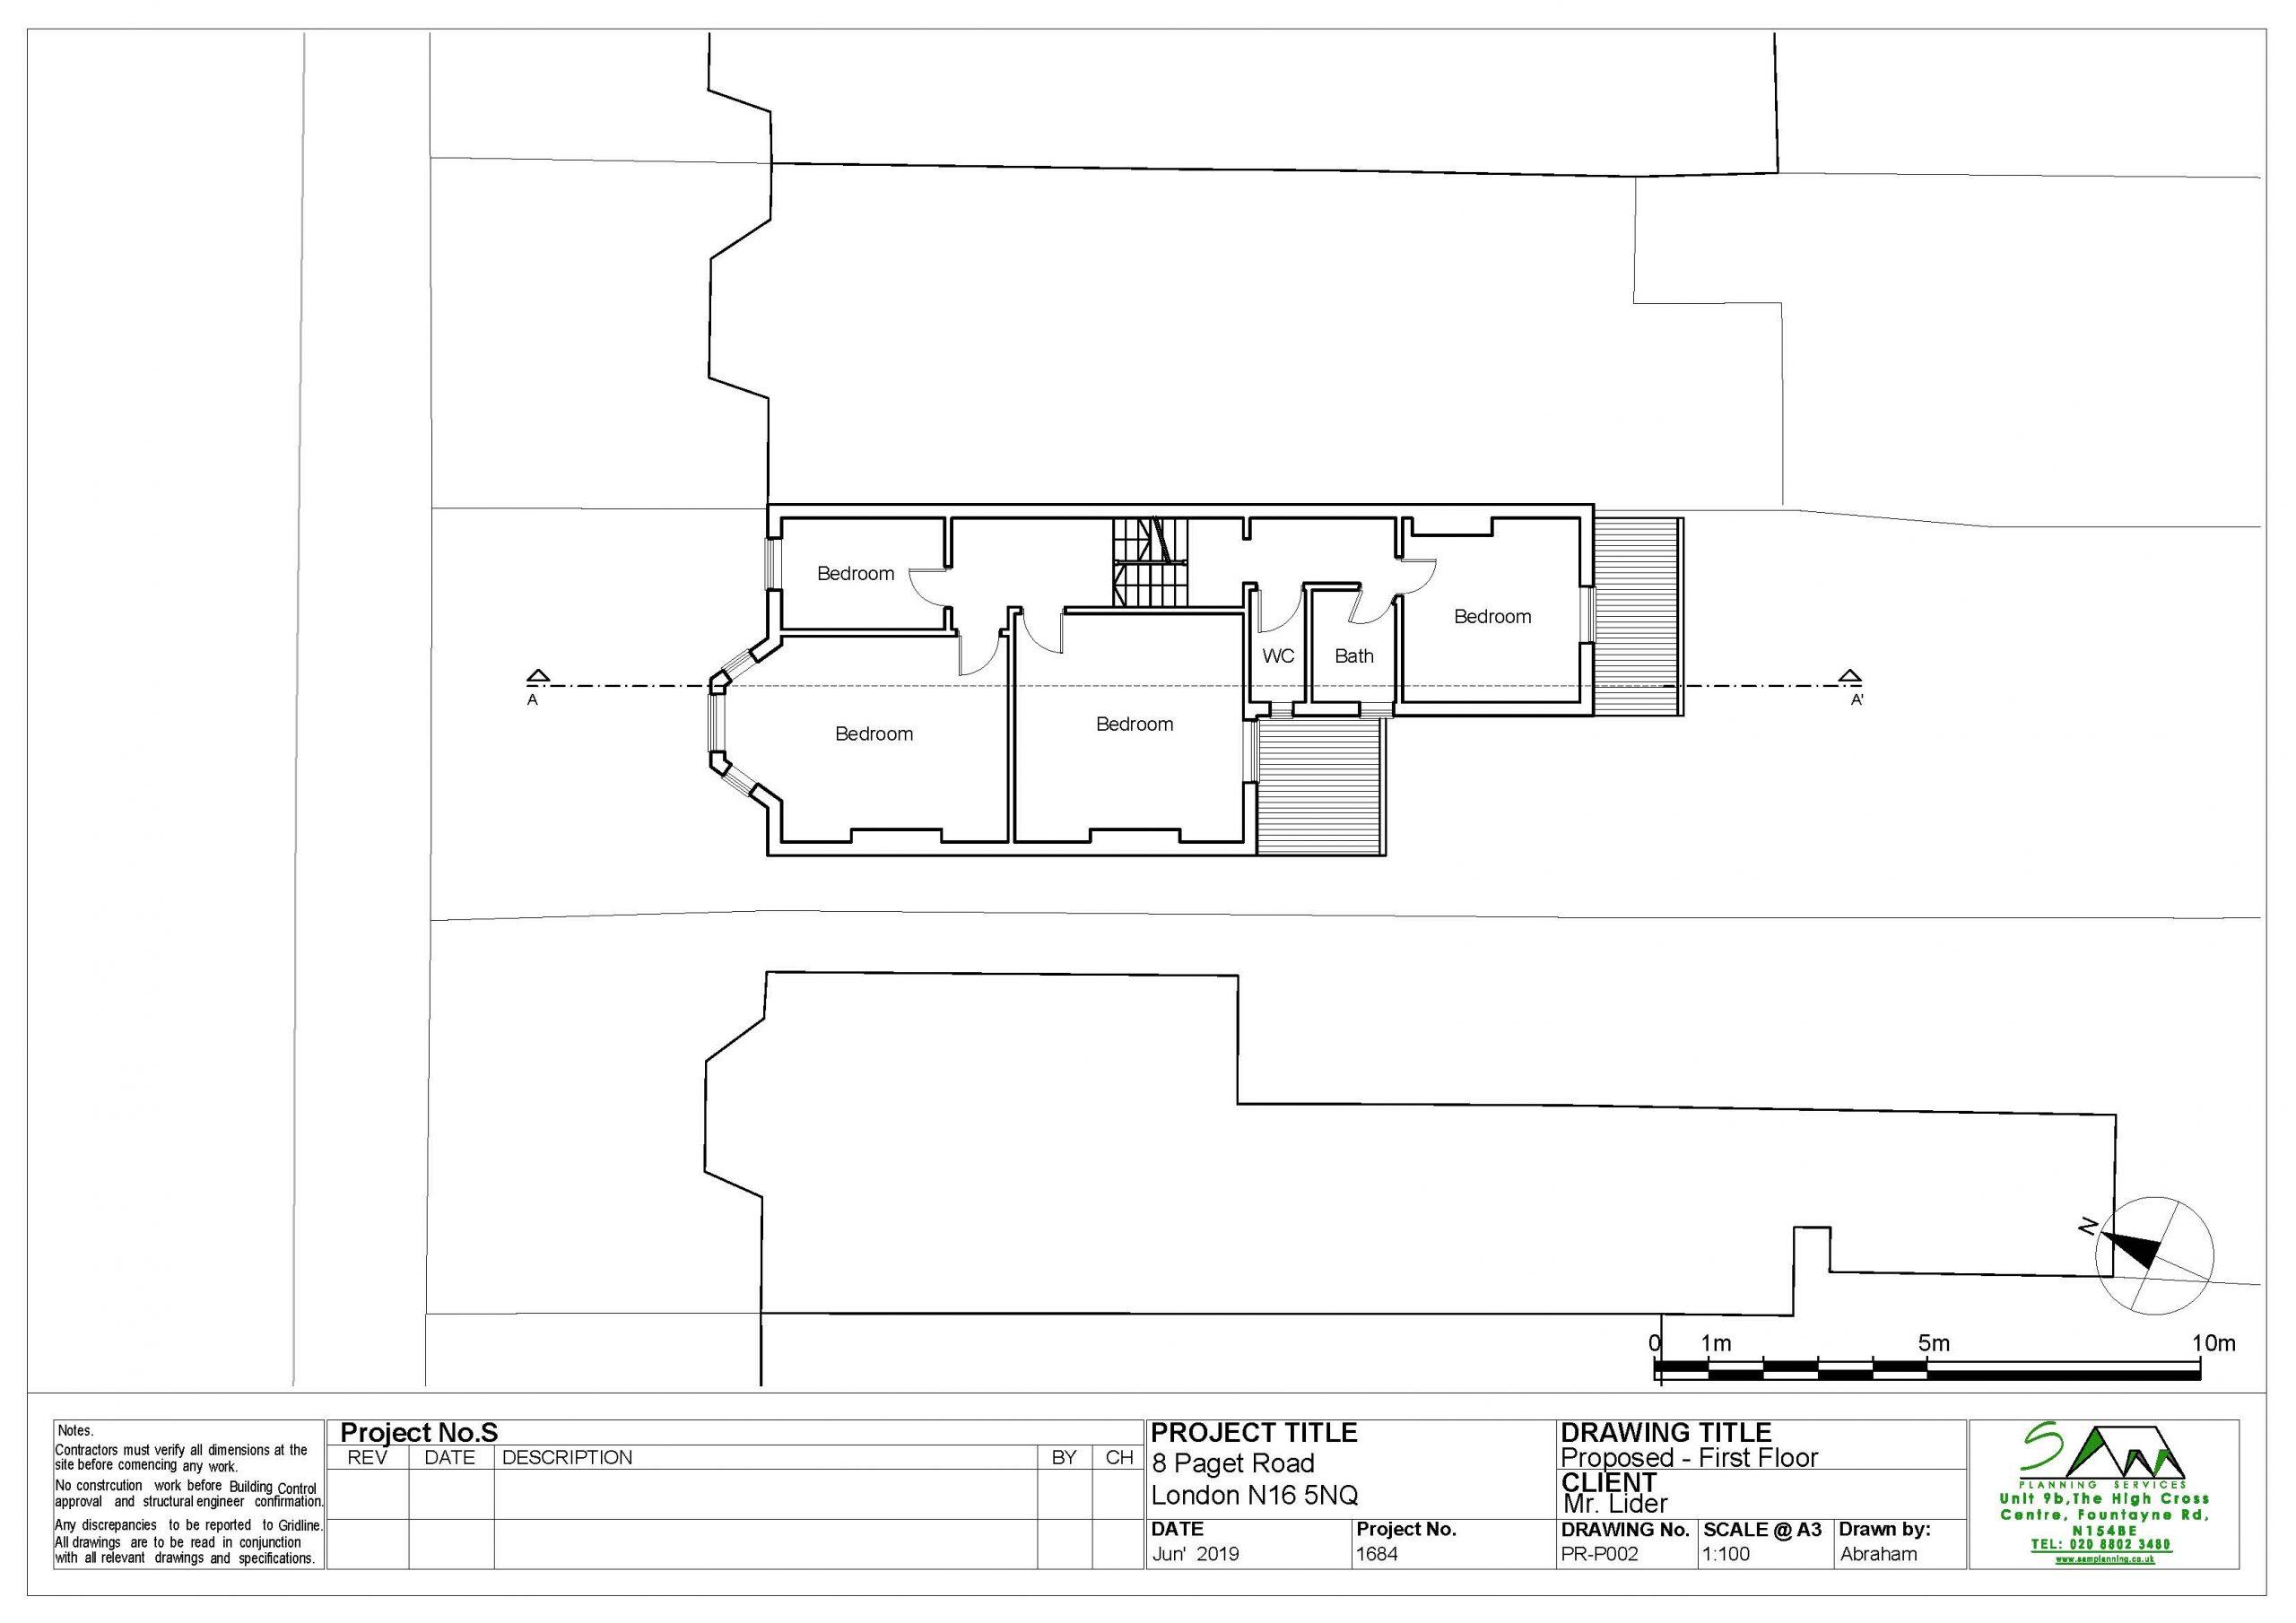 8pagetProposed first floor